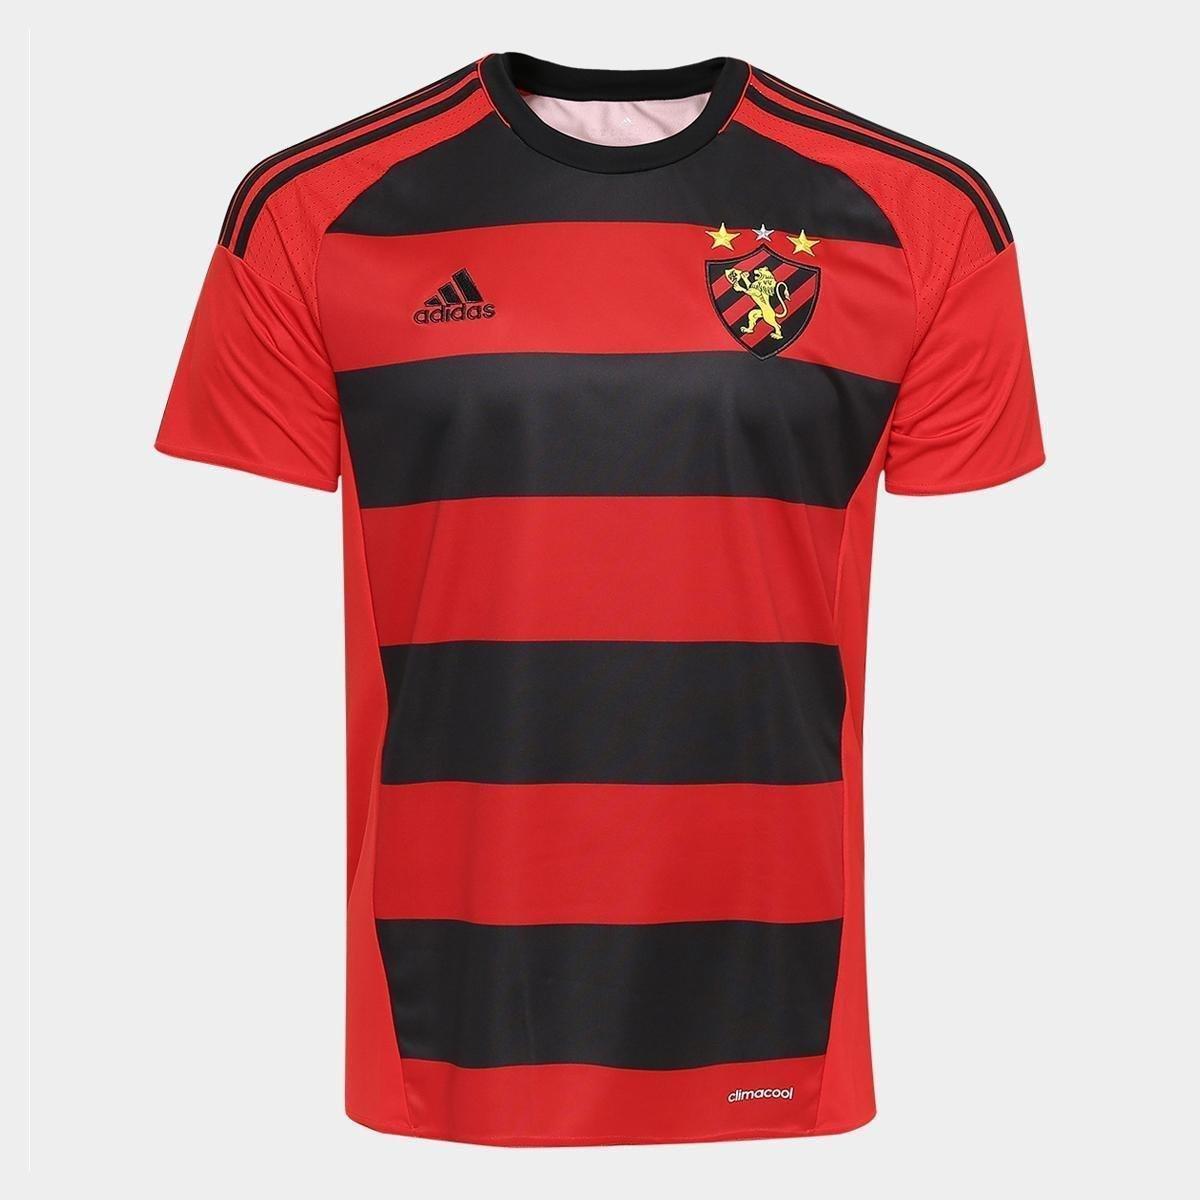 0915291b8 Camisa Sport Recife I 2016 s nº - Torcedor Adidas Masculina